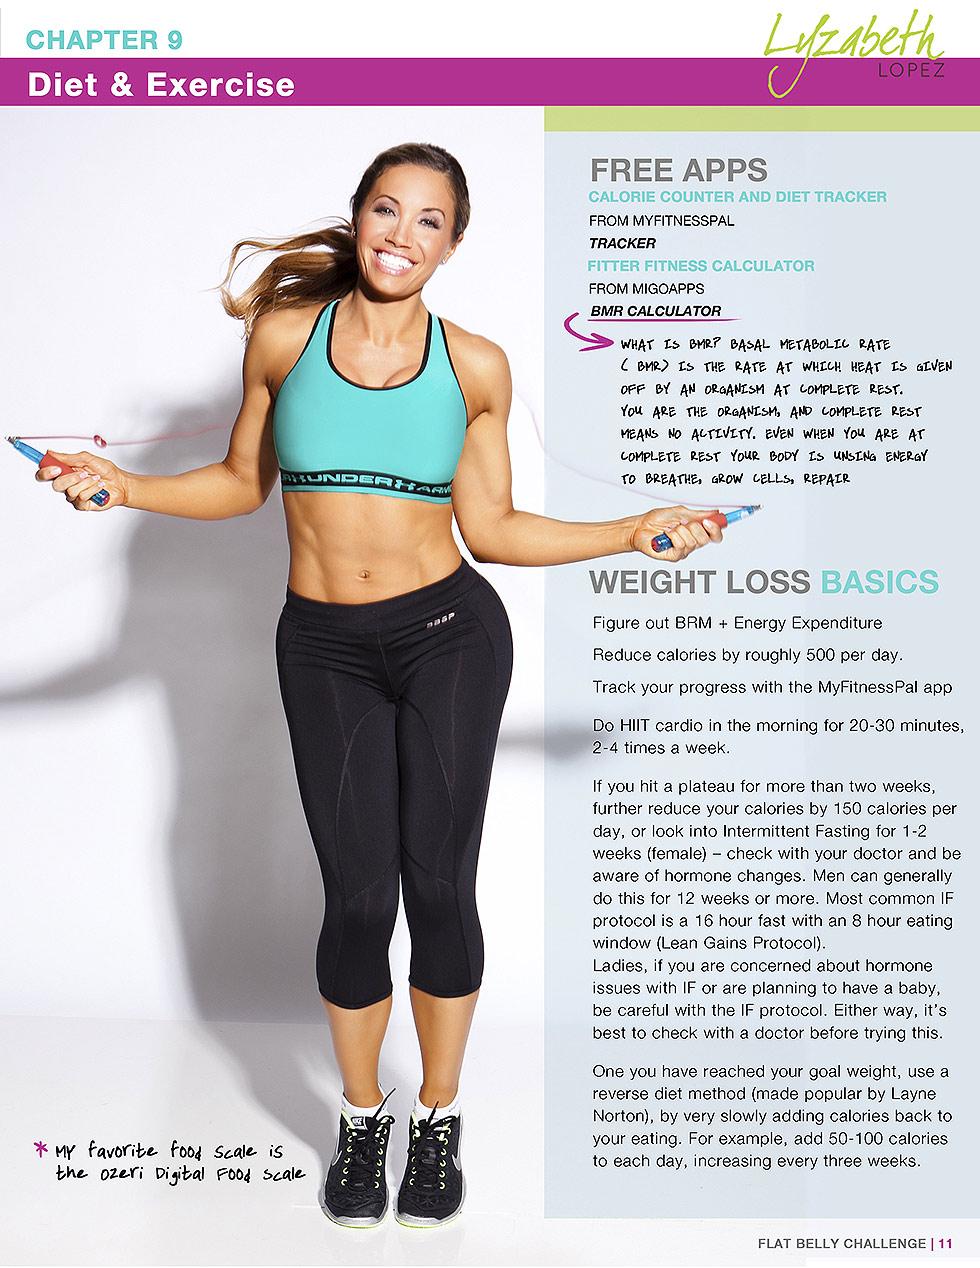 flat-belly-challenge-lyzabeth-lopez_Page_11